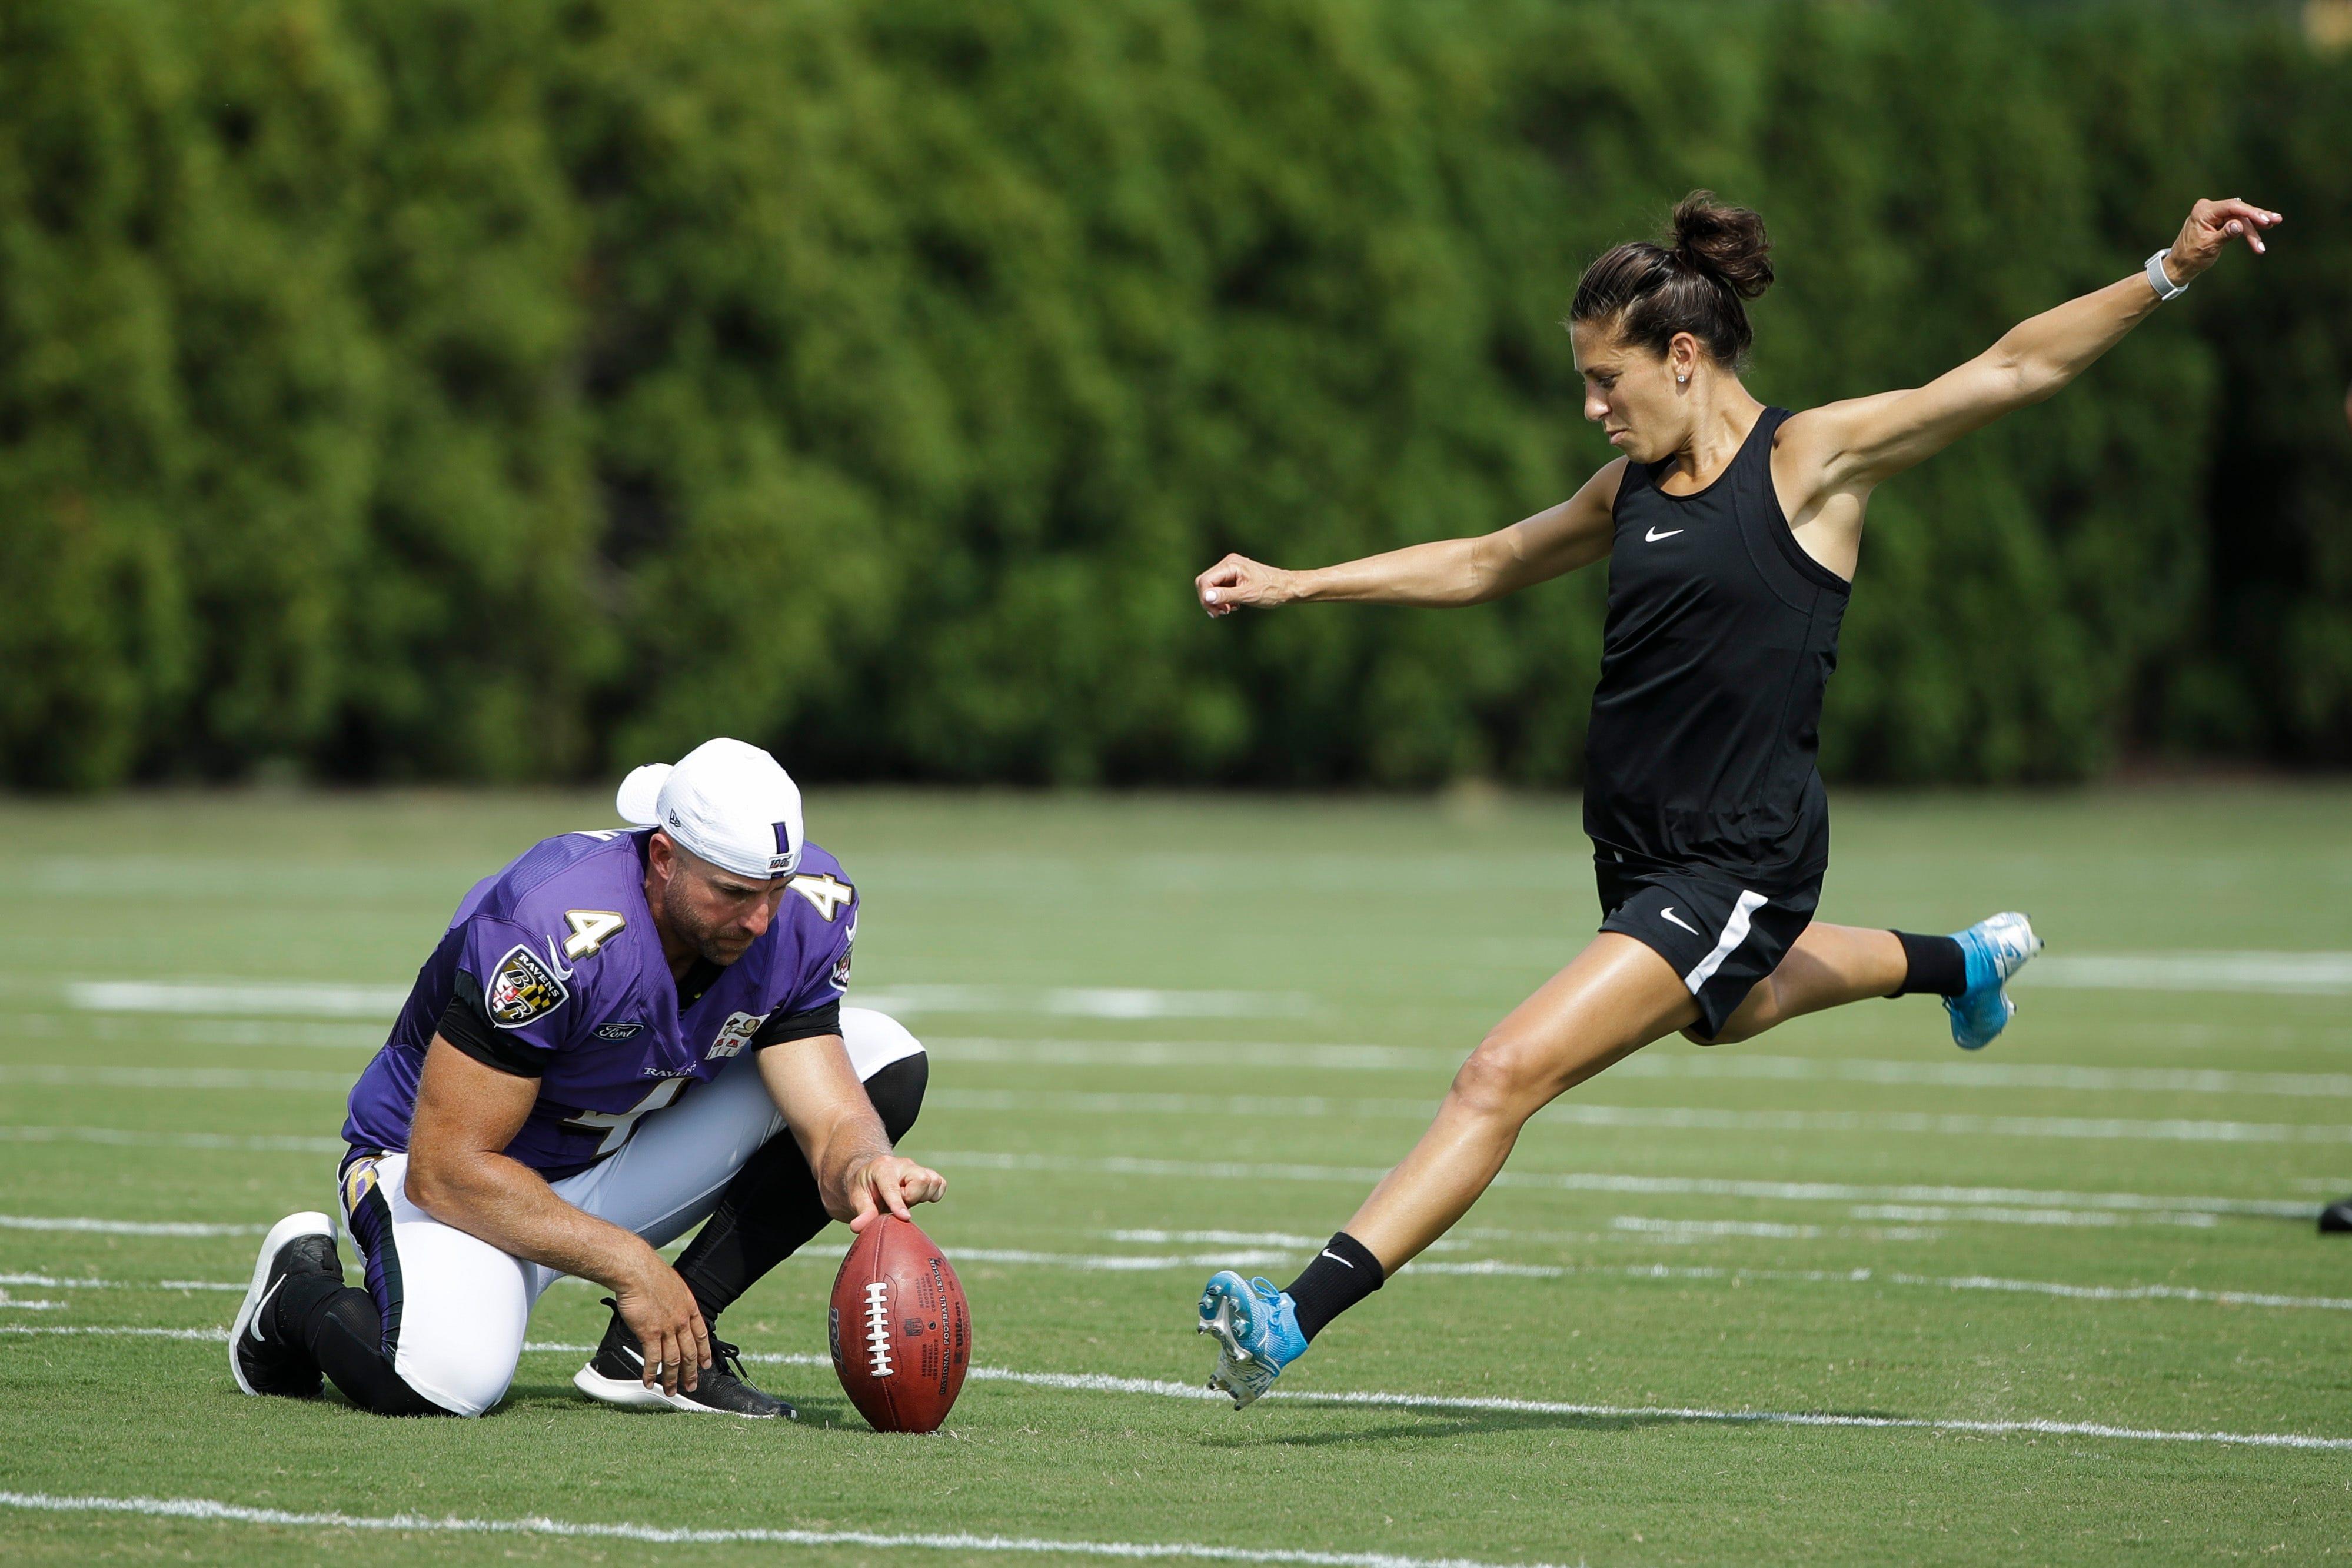 U.S. women's soccer legend Carli Lloyd absolutely drilled a 55-yard FG at Eagles practice